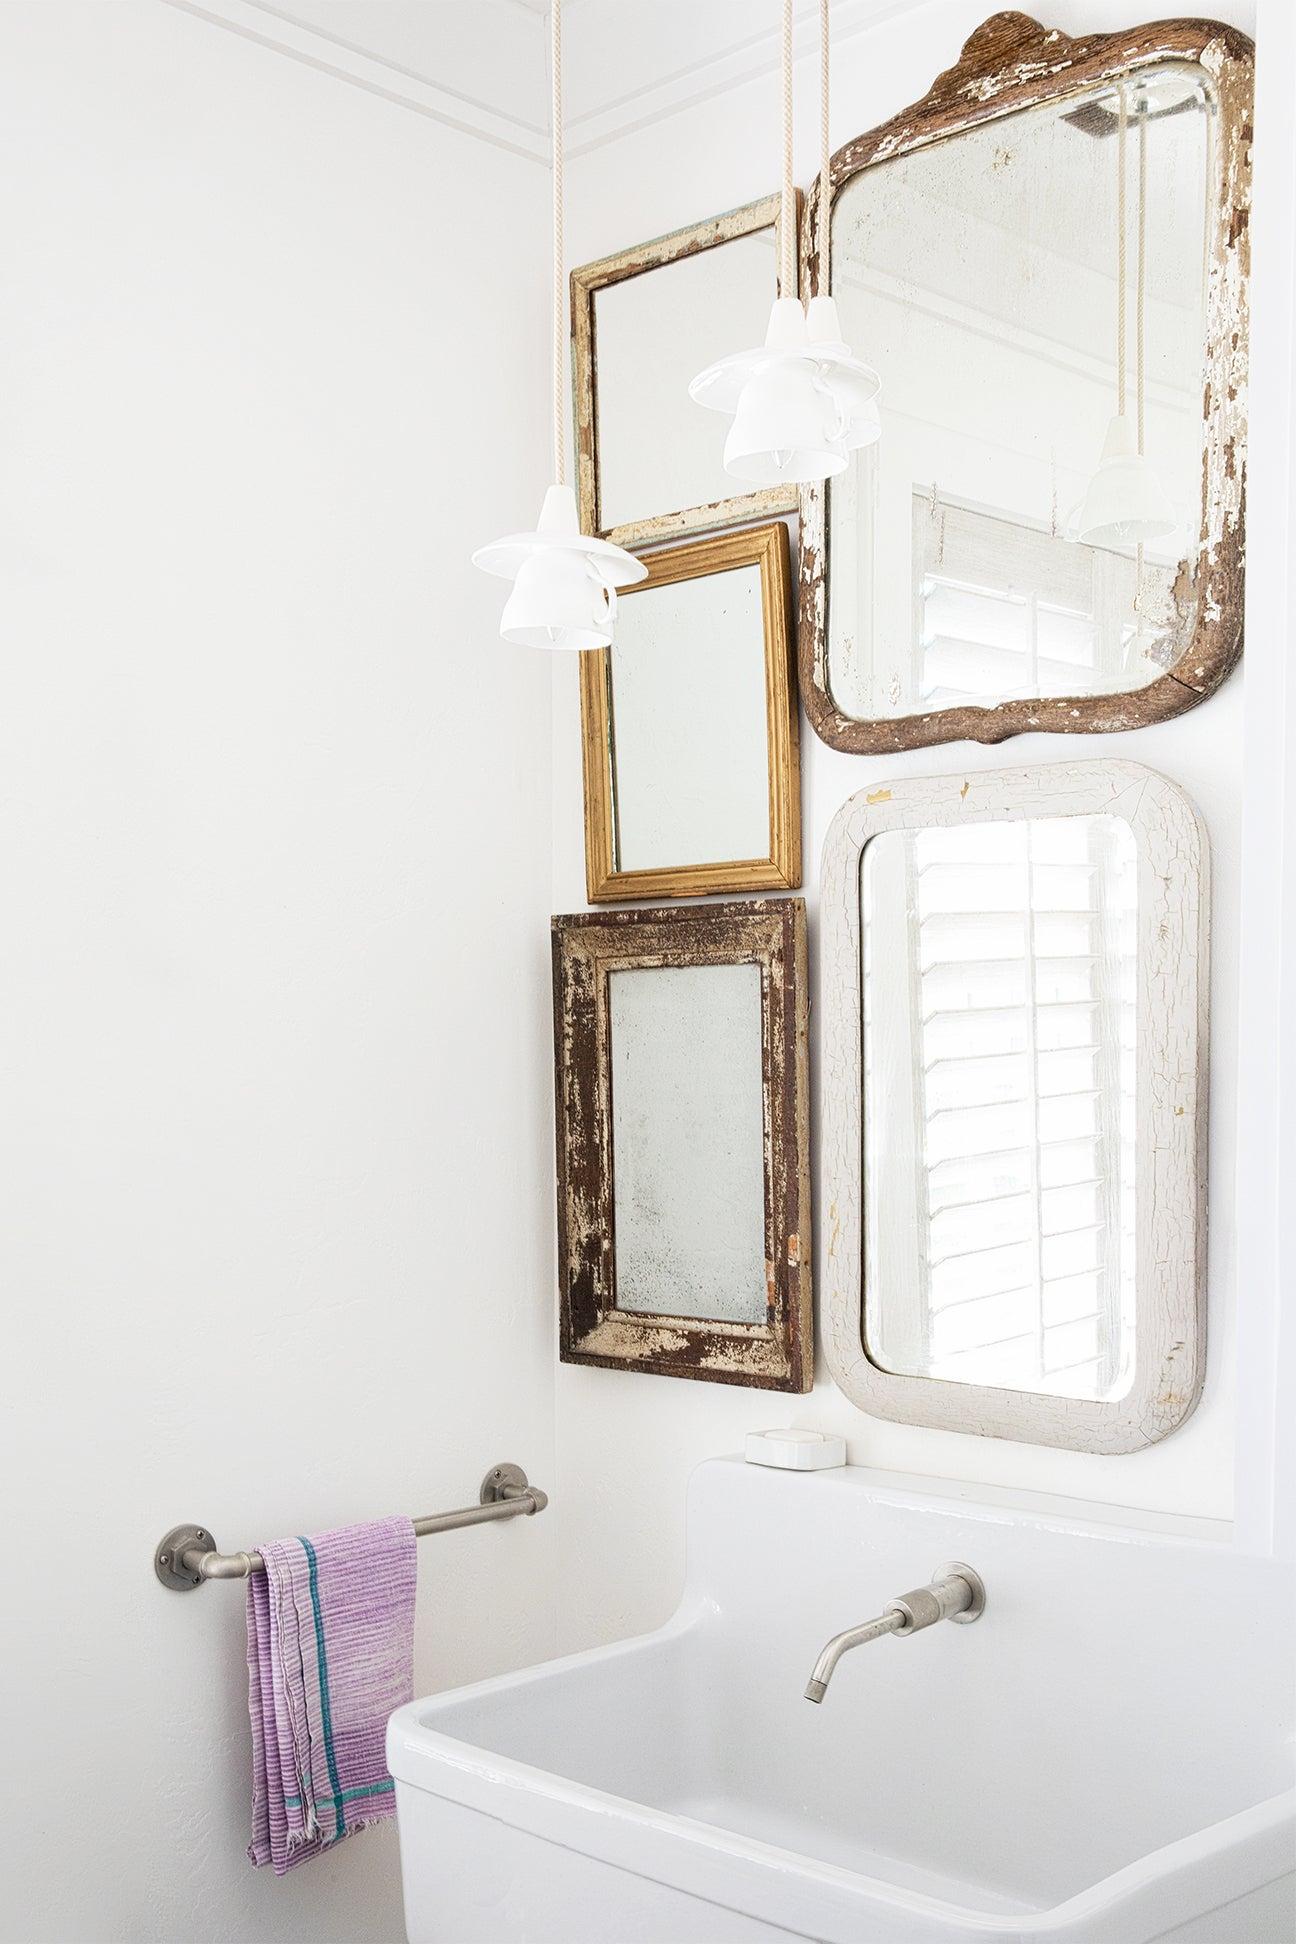 vintage mirros over bathroom sink